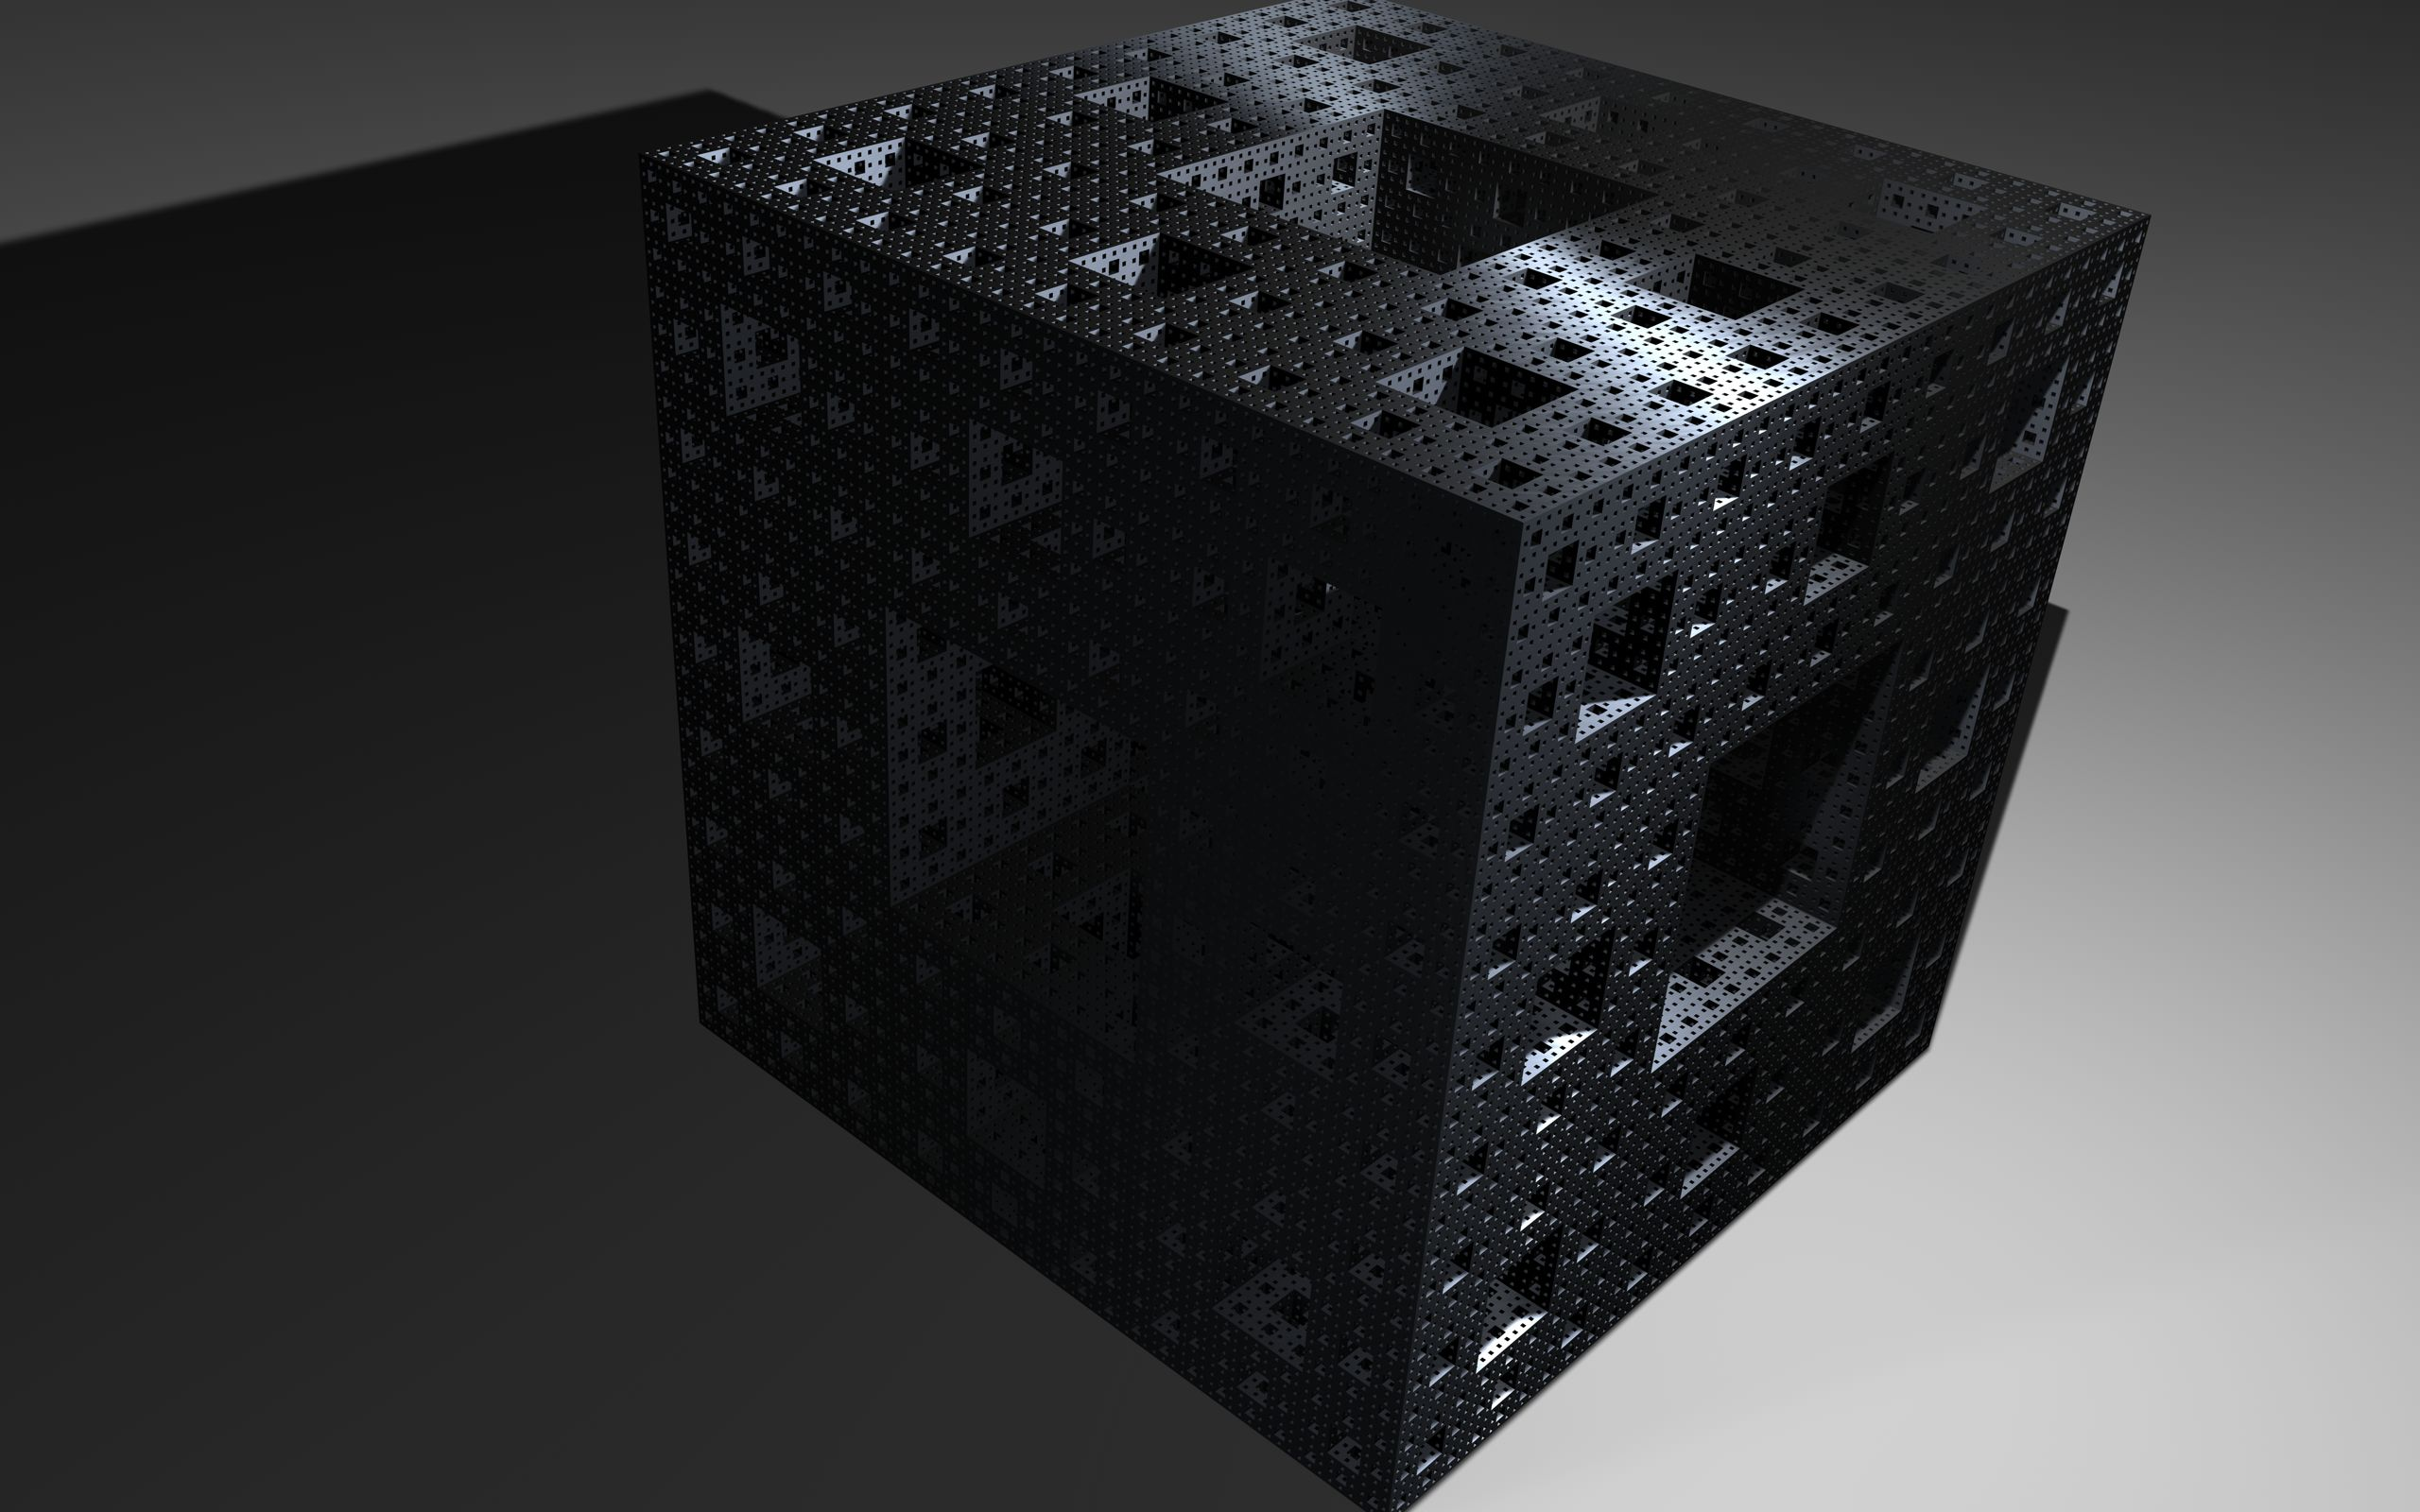 Black Cube Wallpaper